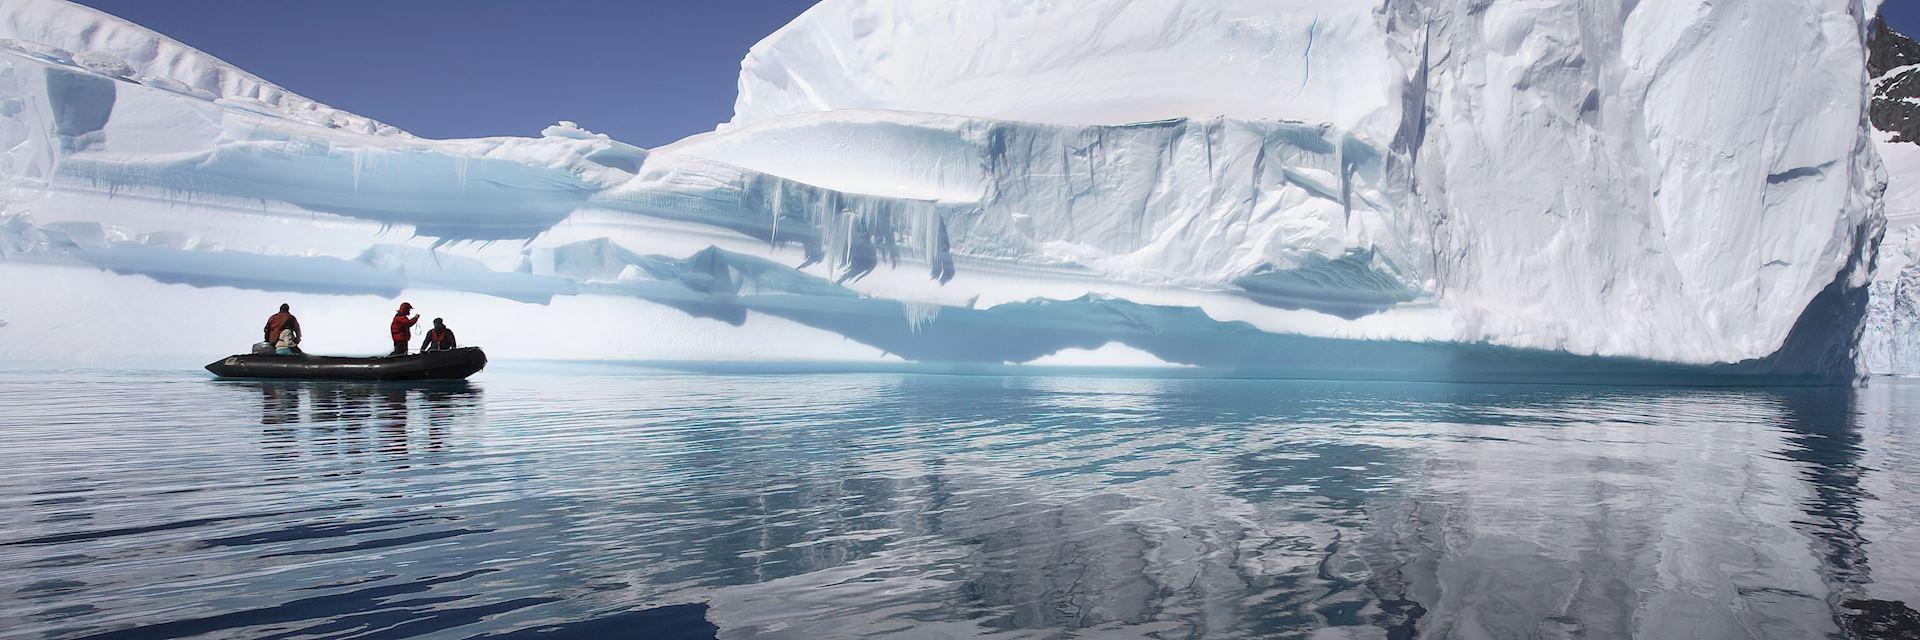 A zodiac excursion in Antarctica